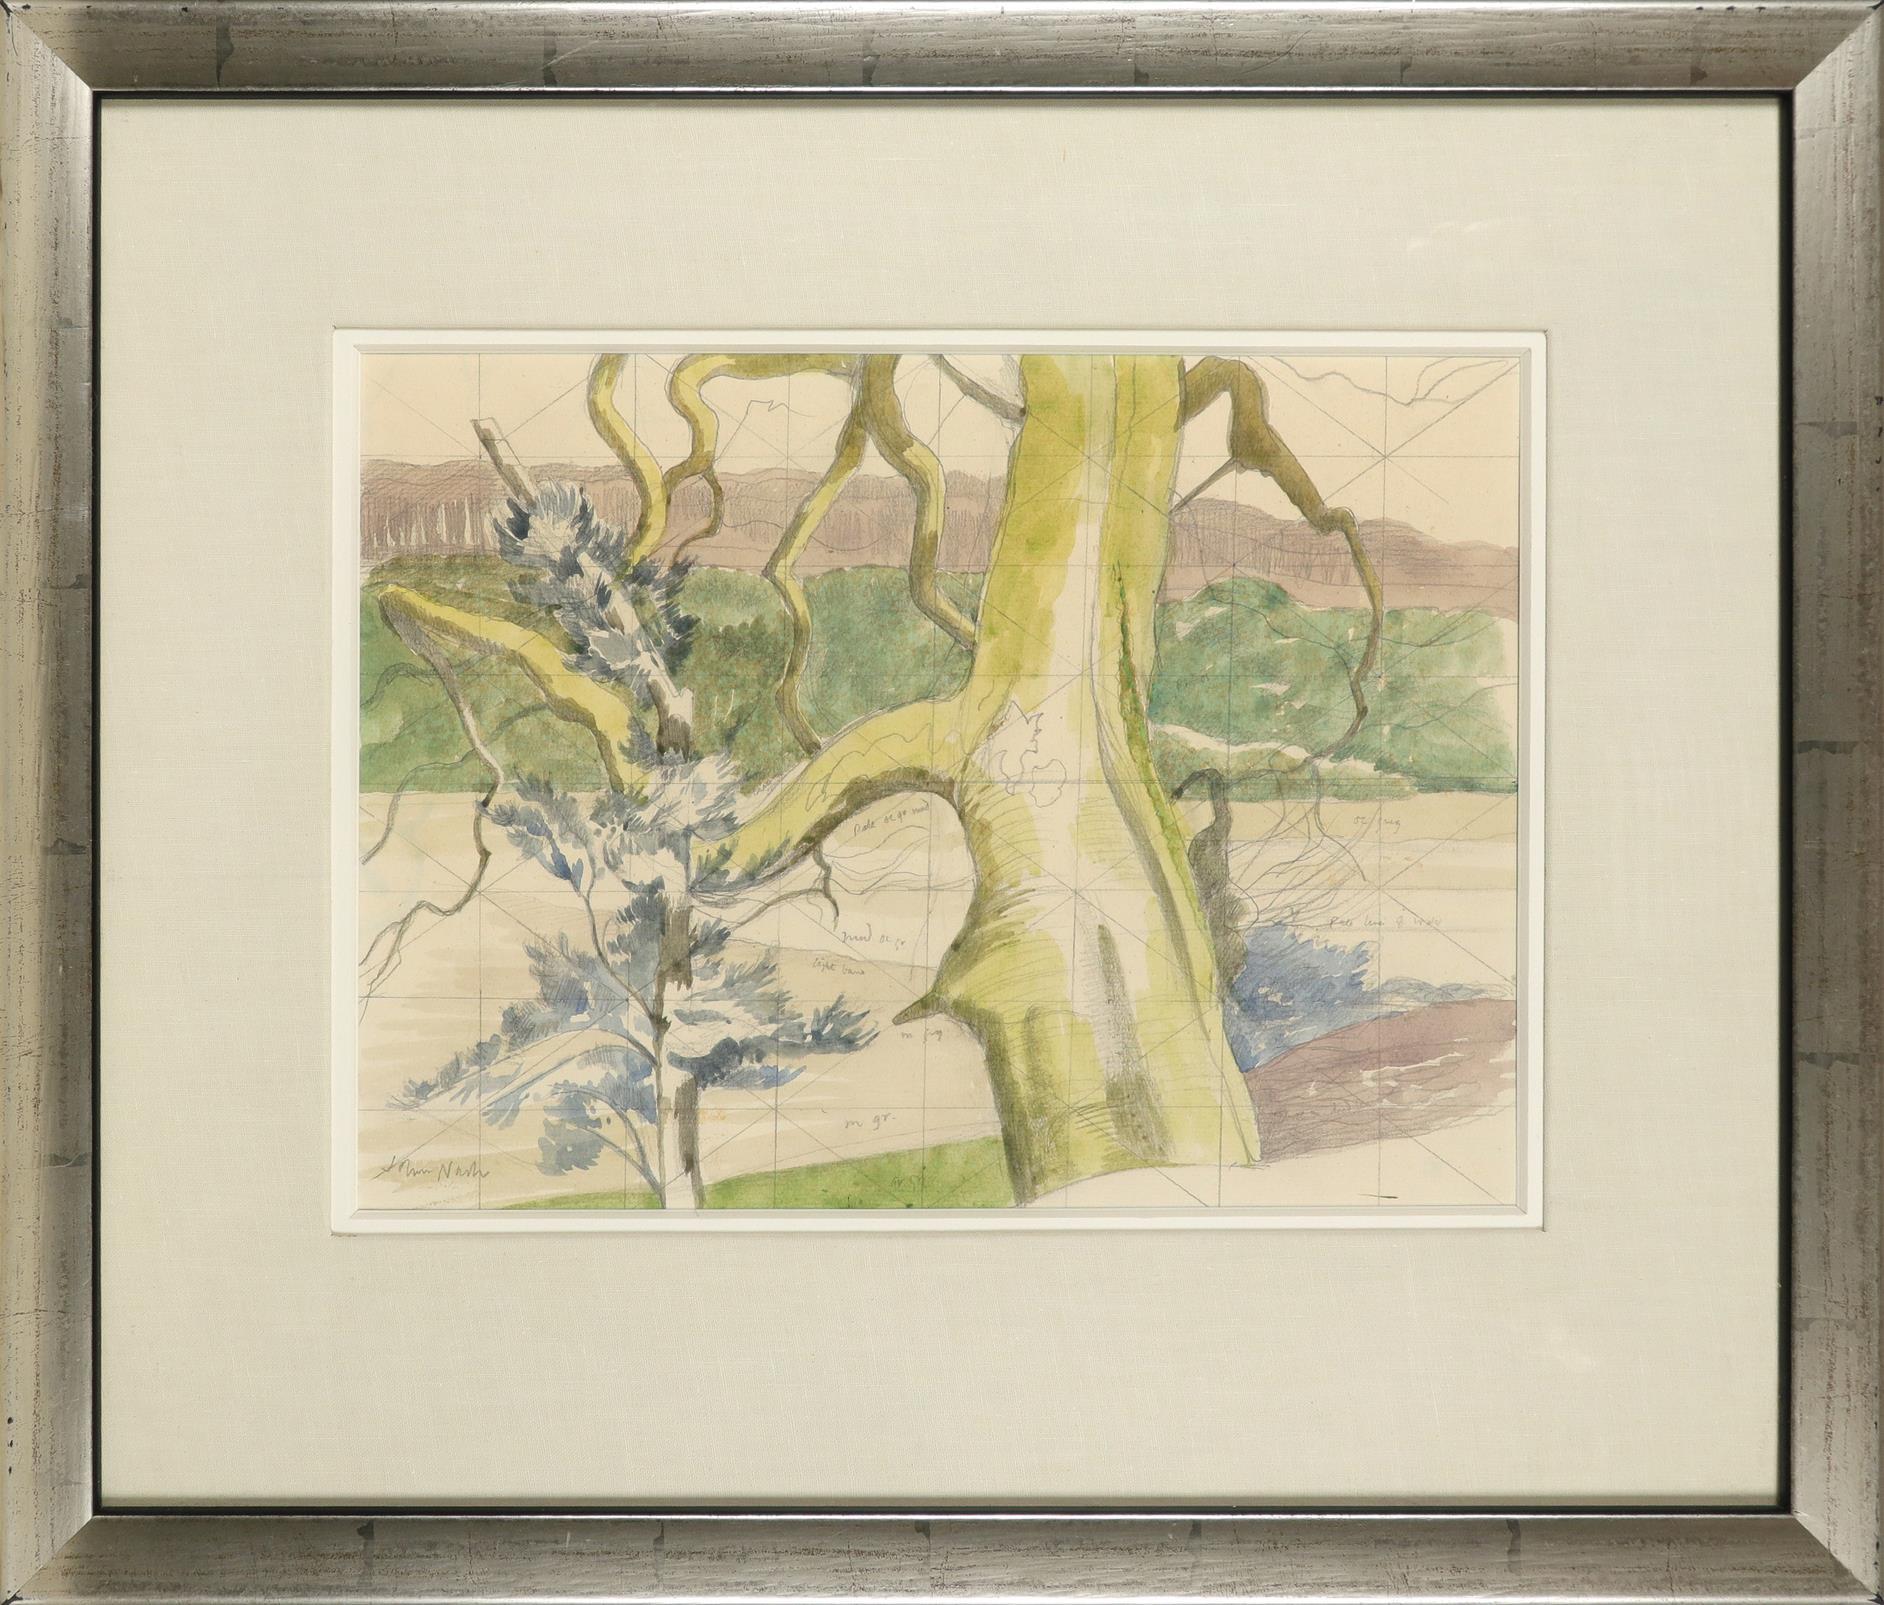 ‡John Nash CBE, RA (1893-1977) Tresililan estuary, Truro Signed John Nash (lower left) and variously - Image 2 of 3